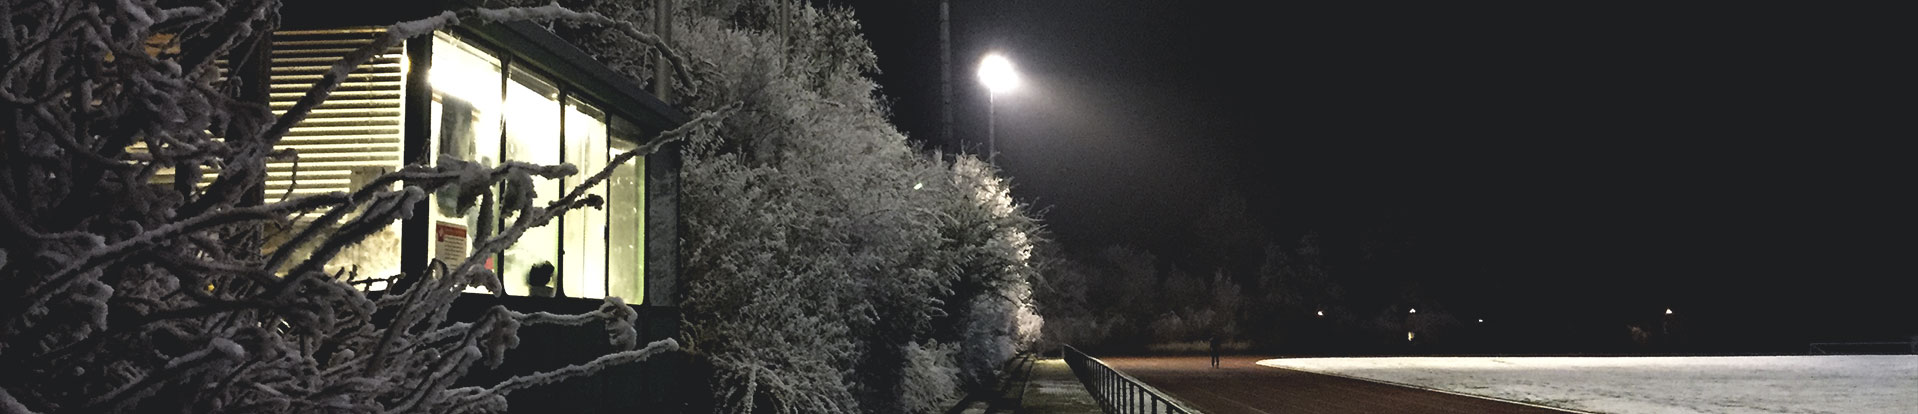 BZW-Winter-3